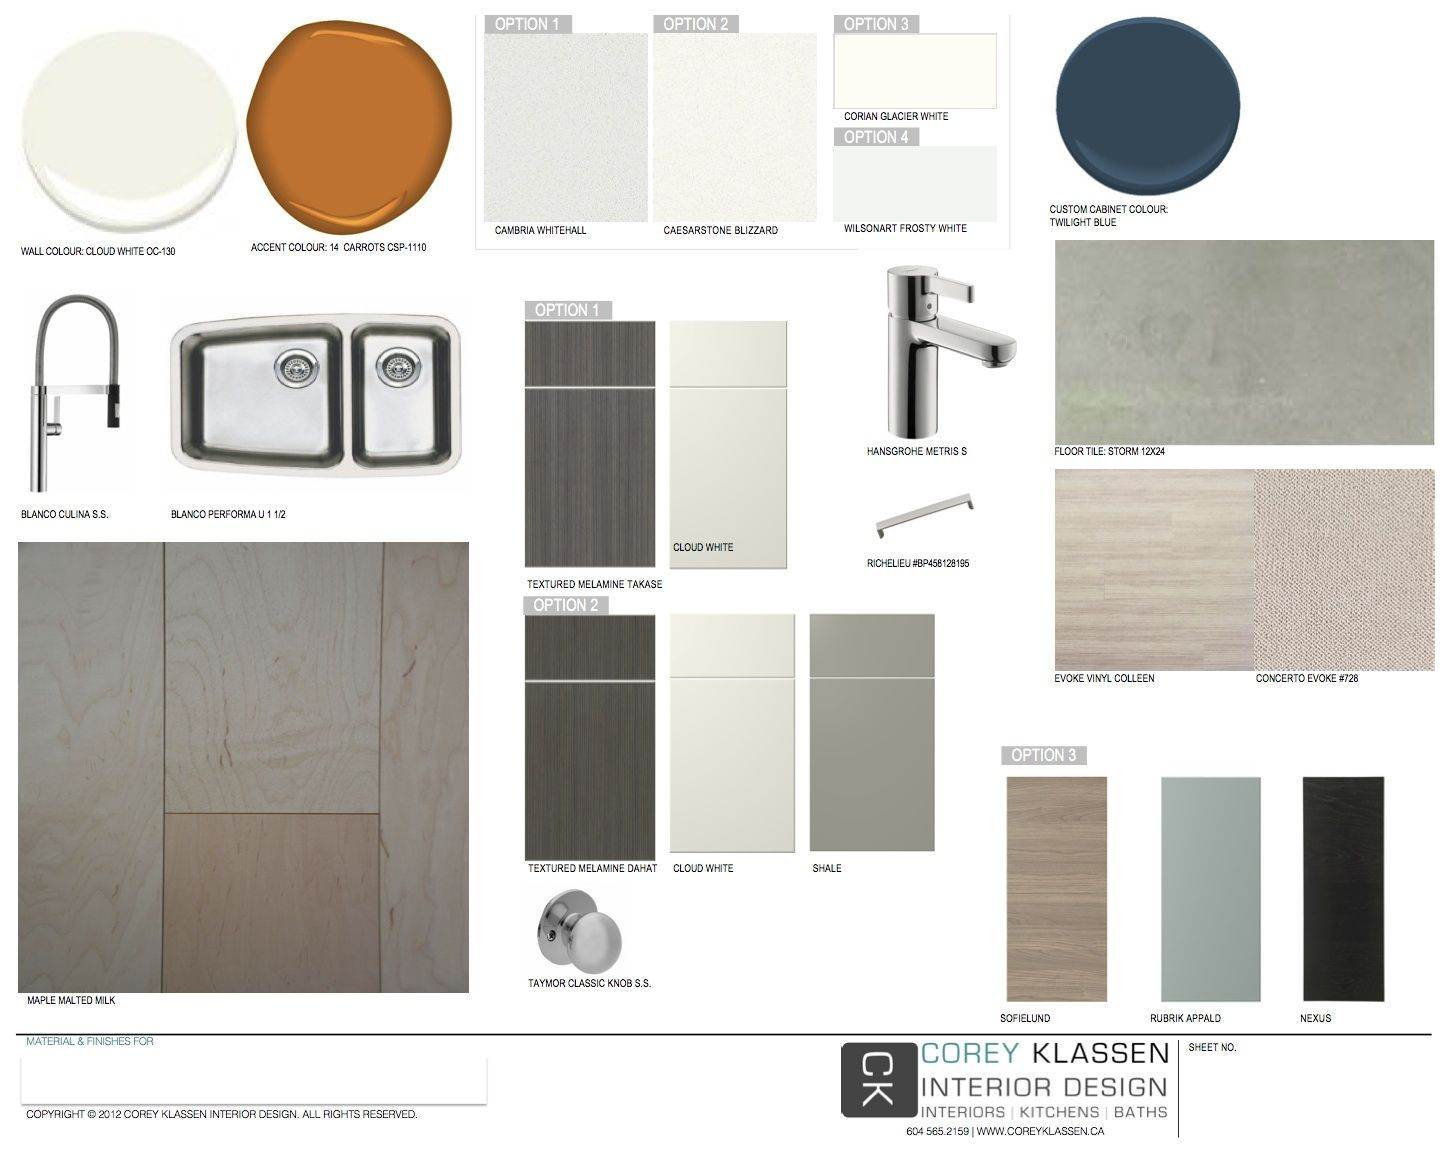 Digitial Material Board From Corey Klassen Interior Design